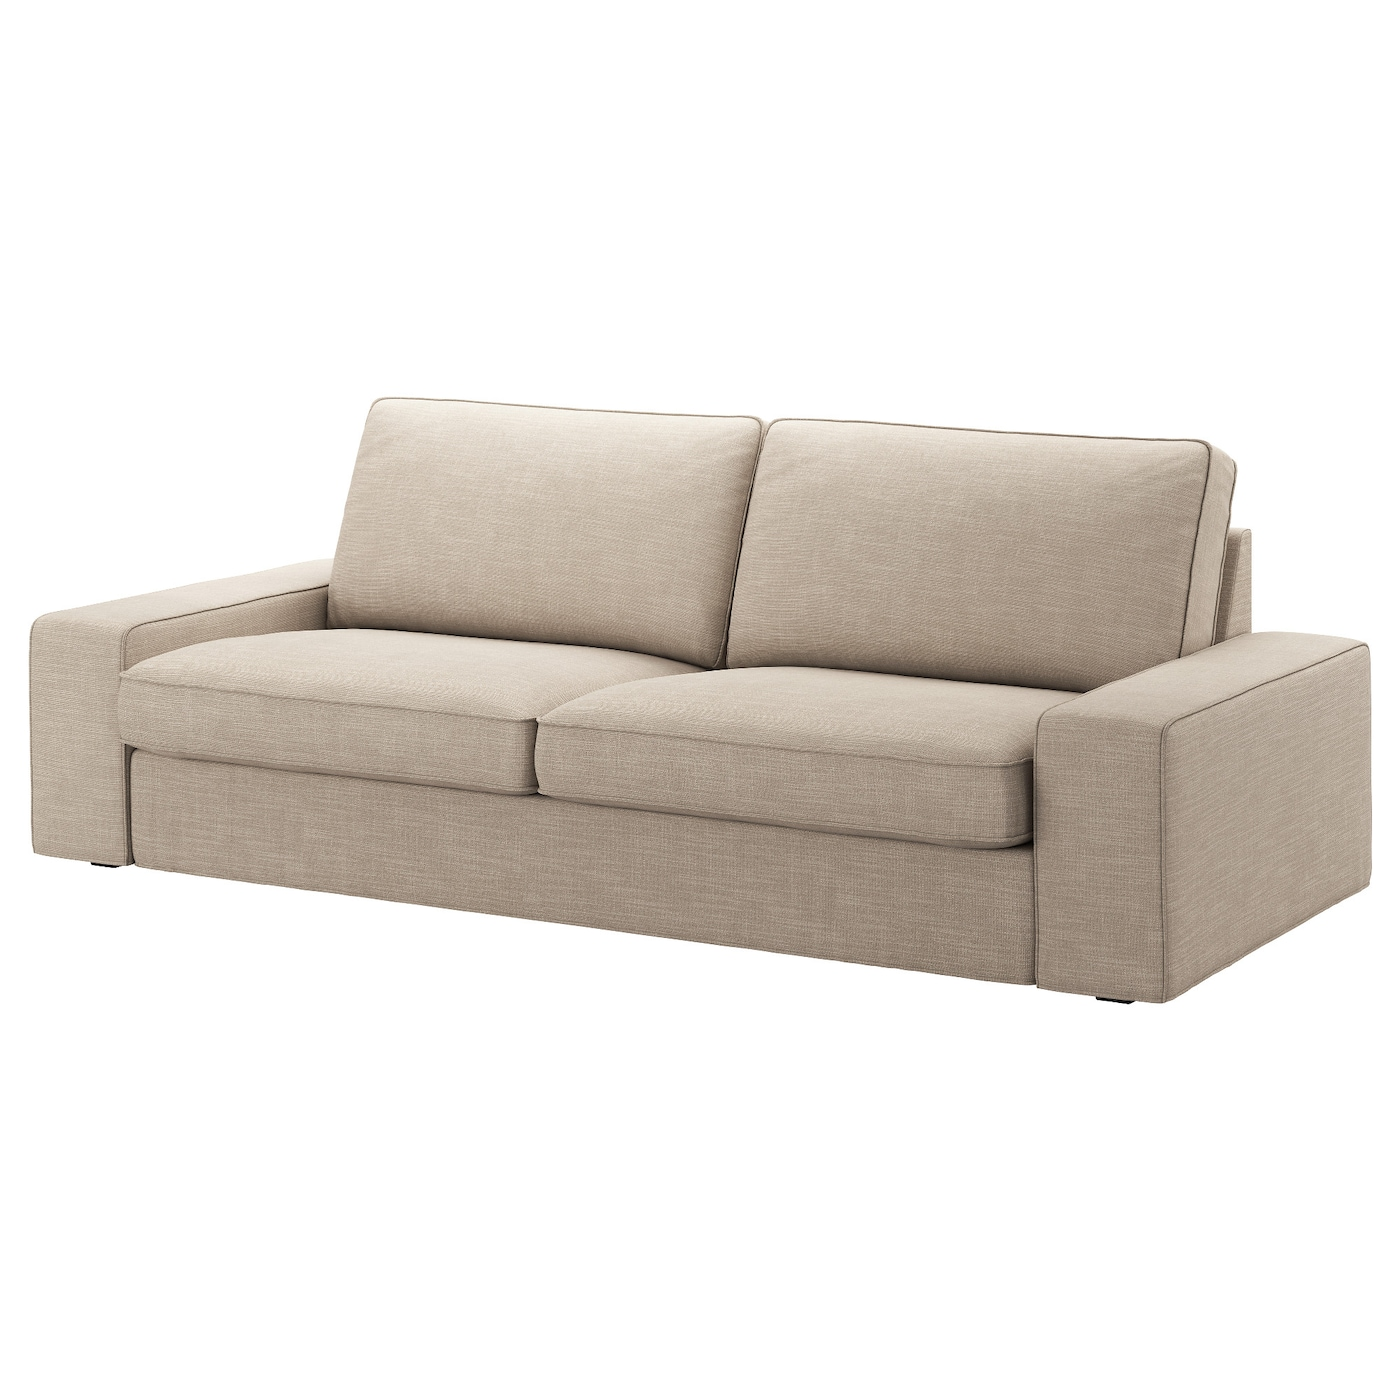 Kivik Three Seat Sofa Hillared Beige Ikea